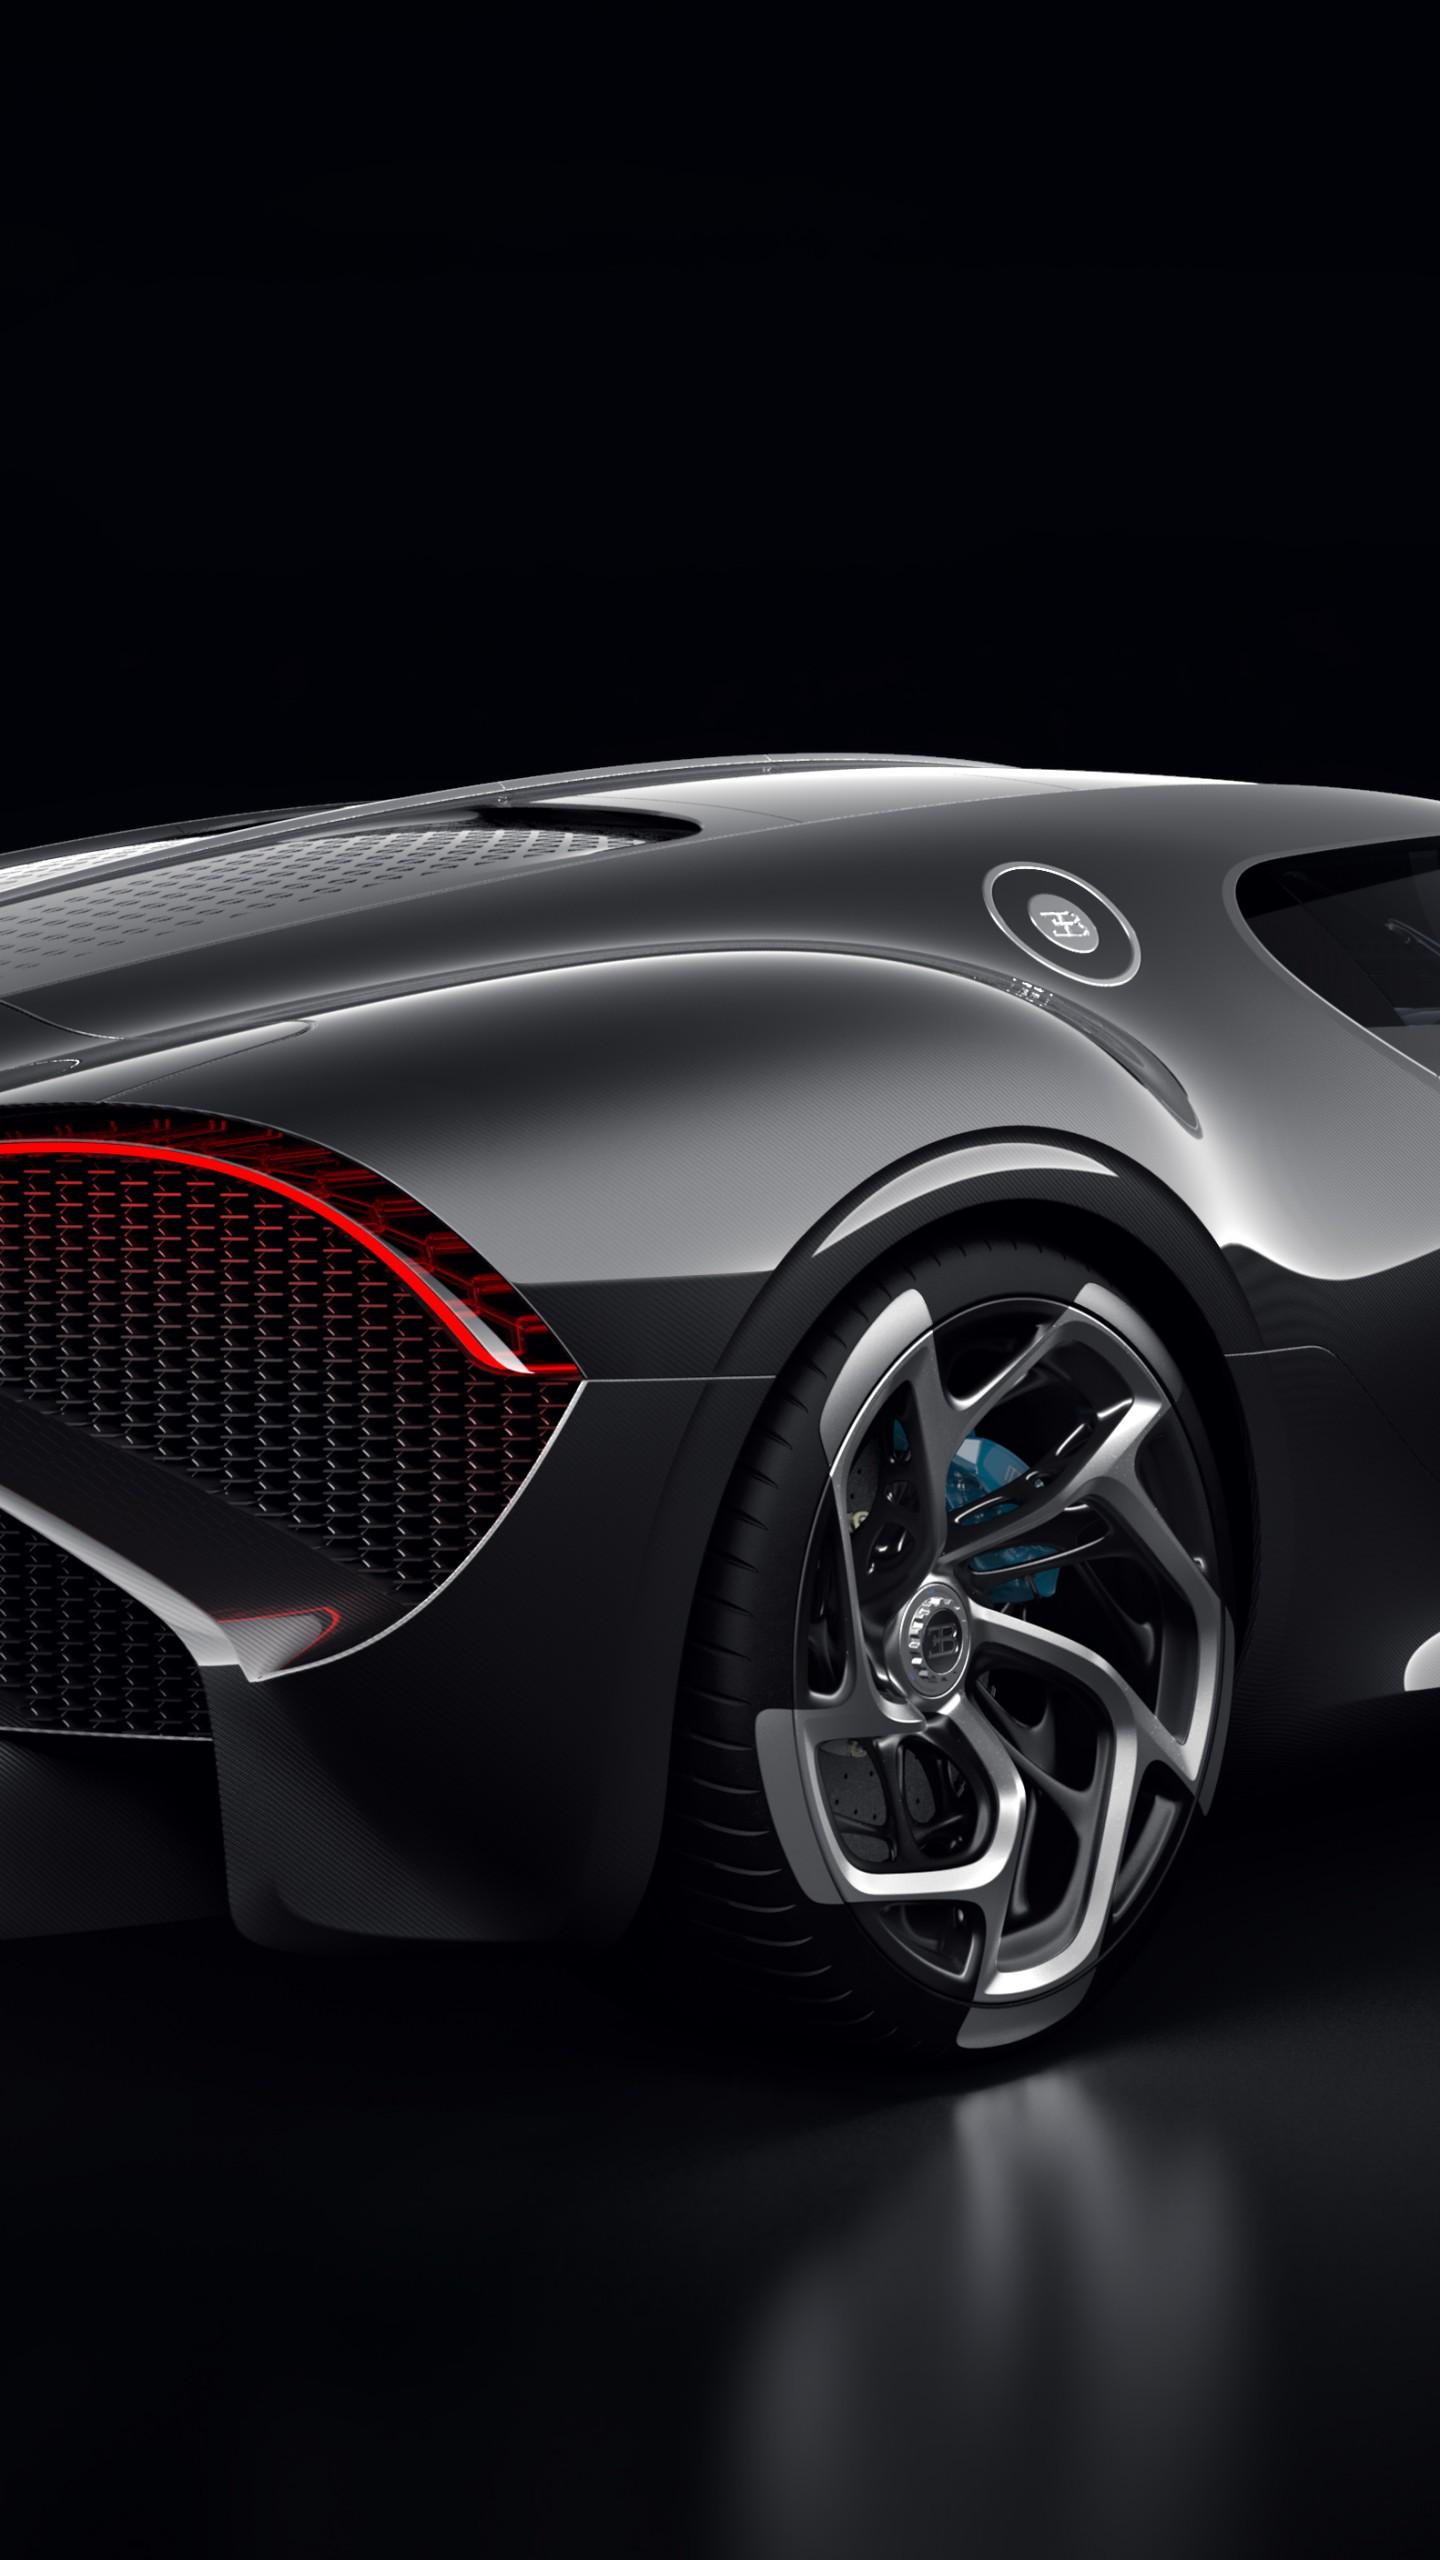 wallpaper bugatti la voiture noire  geneva motor show 2019  2019 cars  supercar  5k  cars